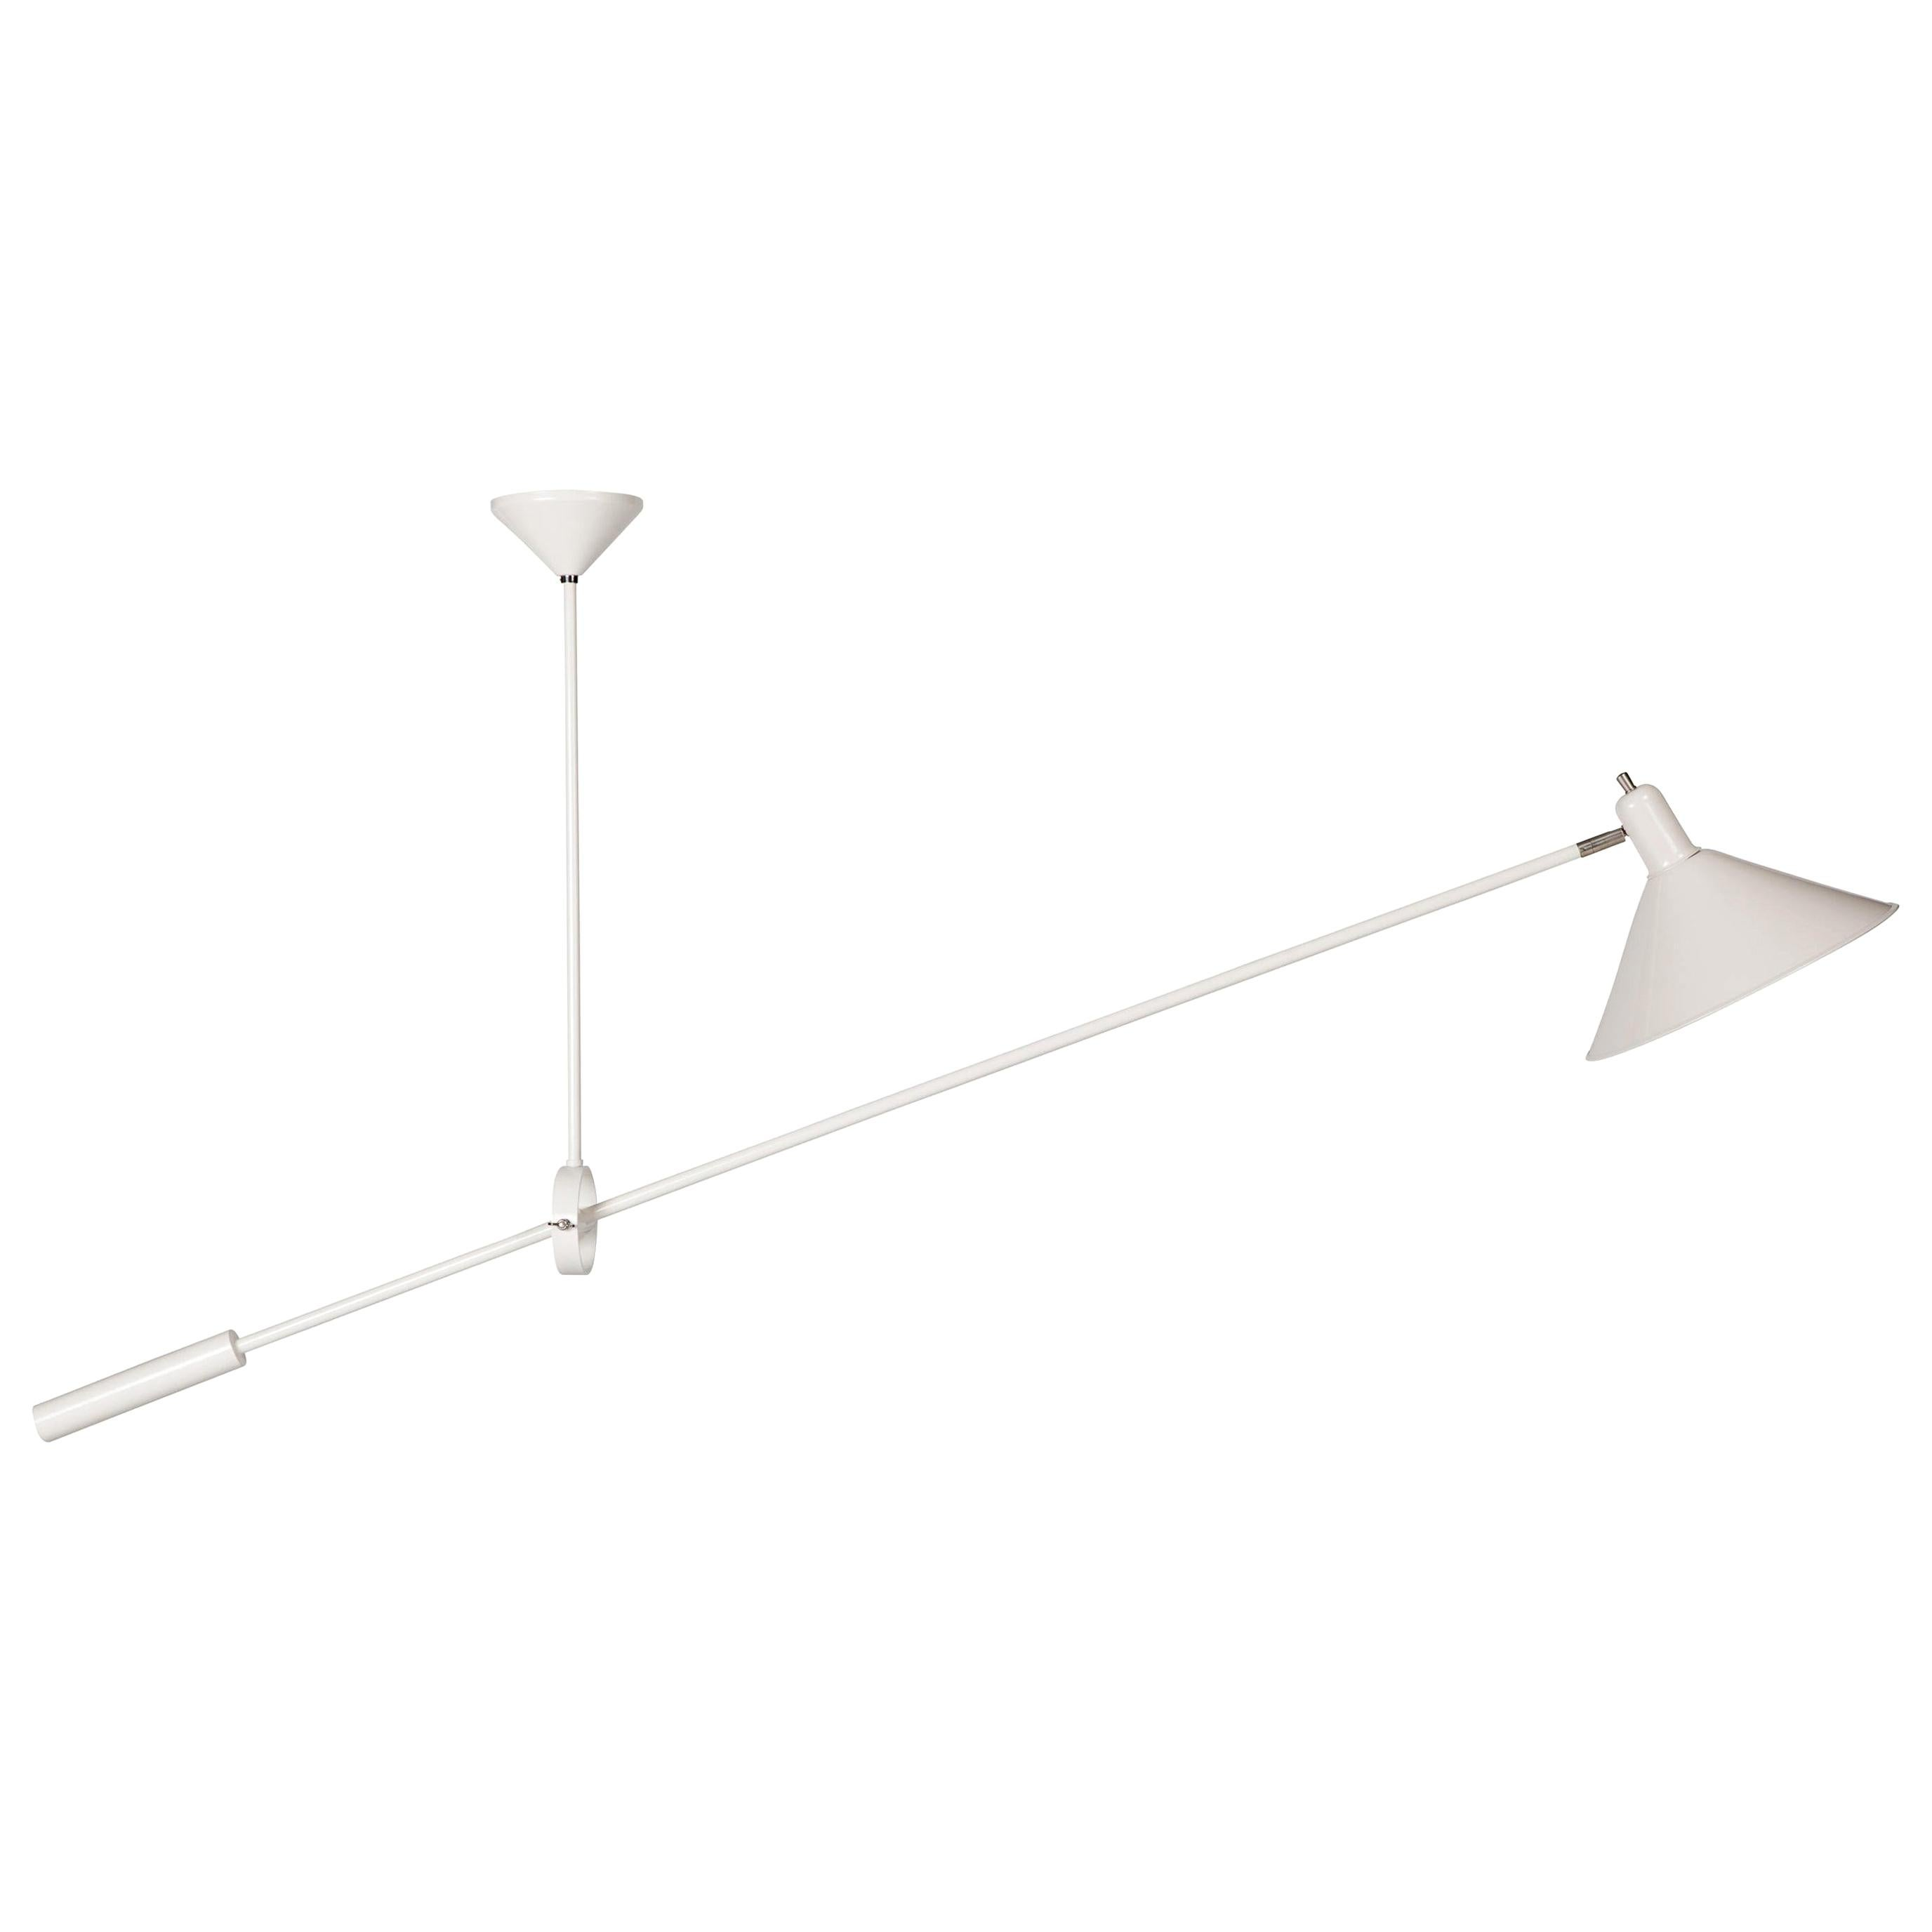 J.J.M. Hoogervorst Counterbalance Ceiling Light in White for Anvia